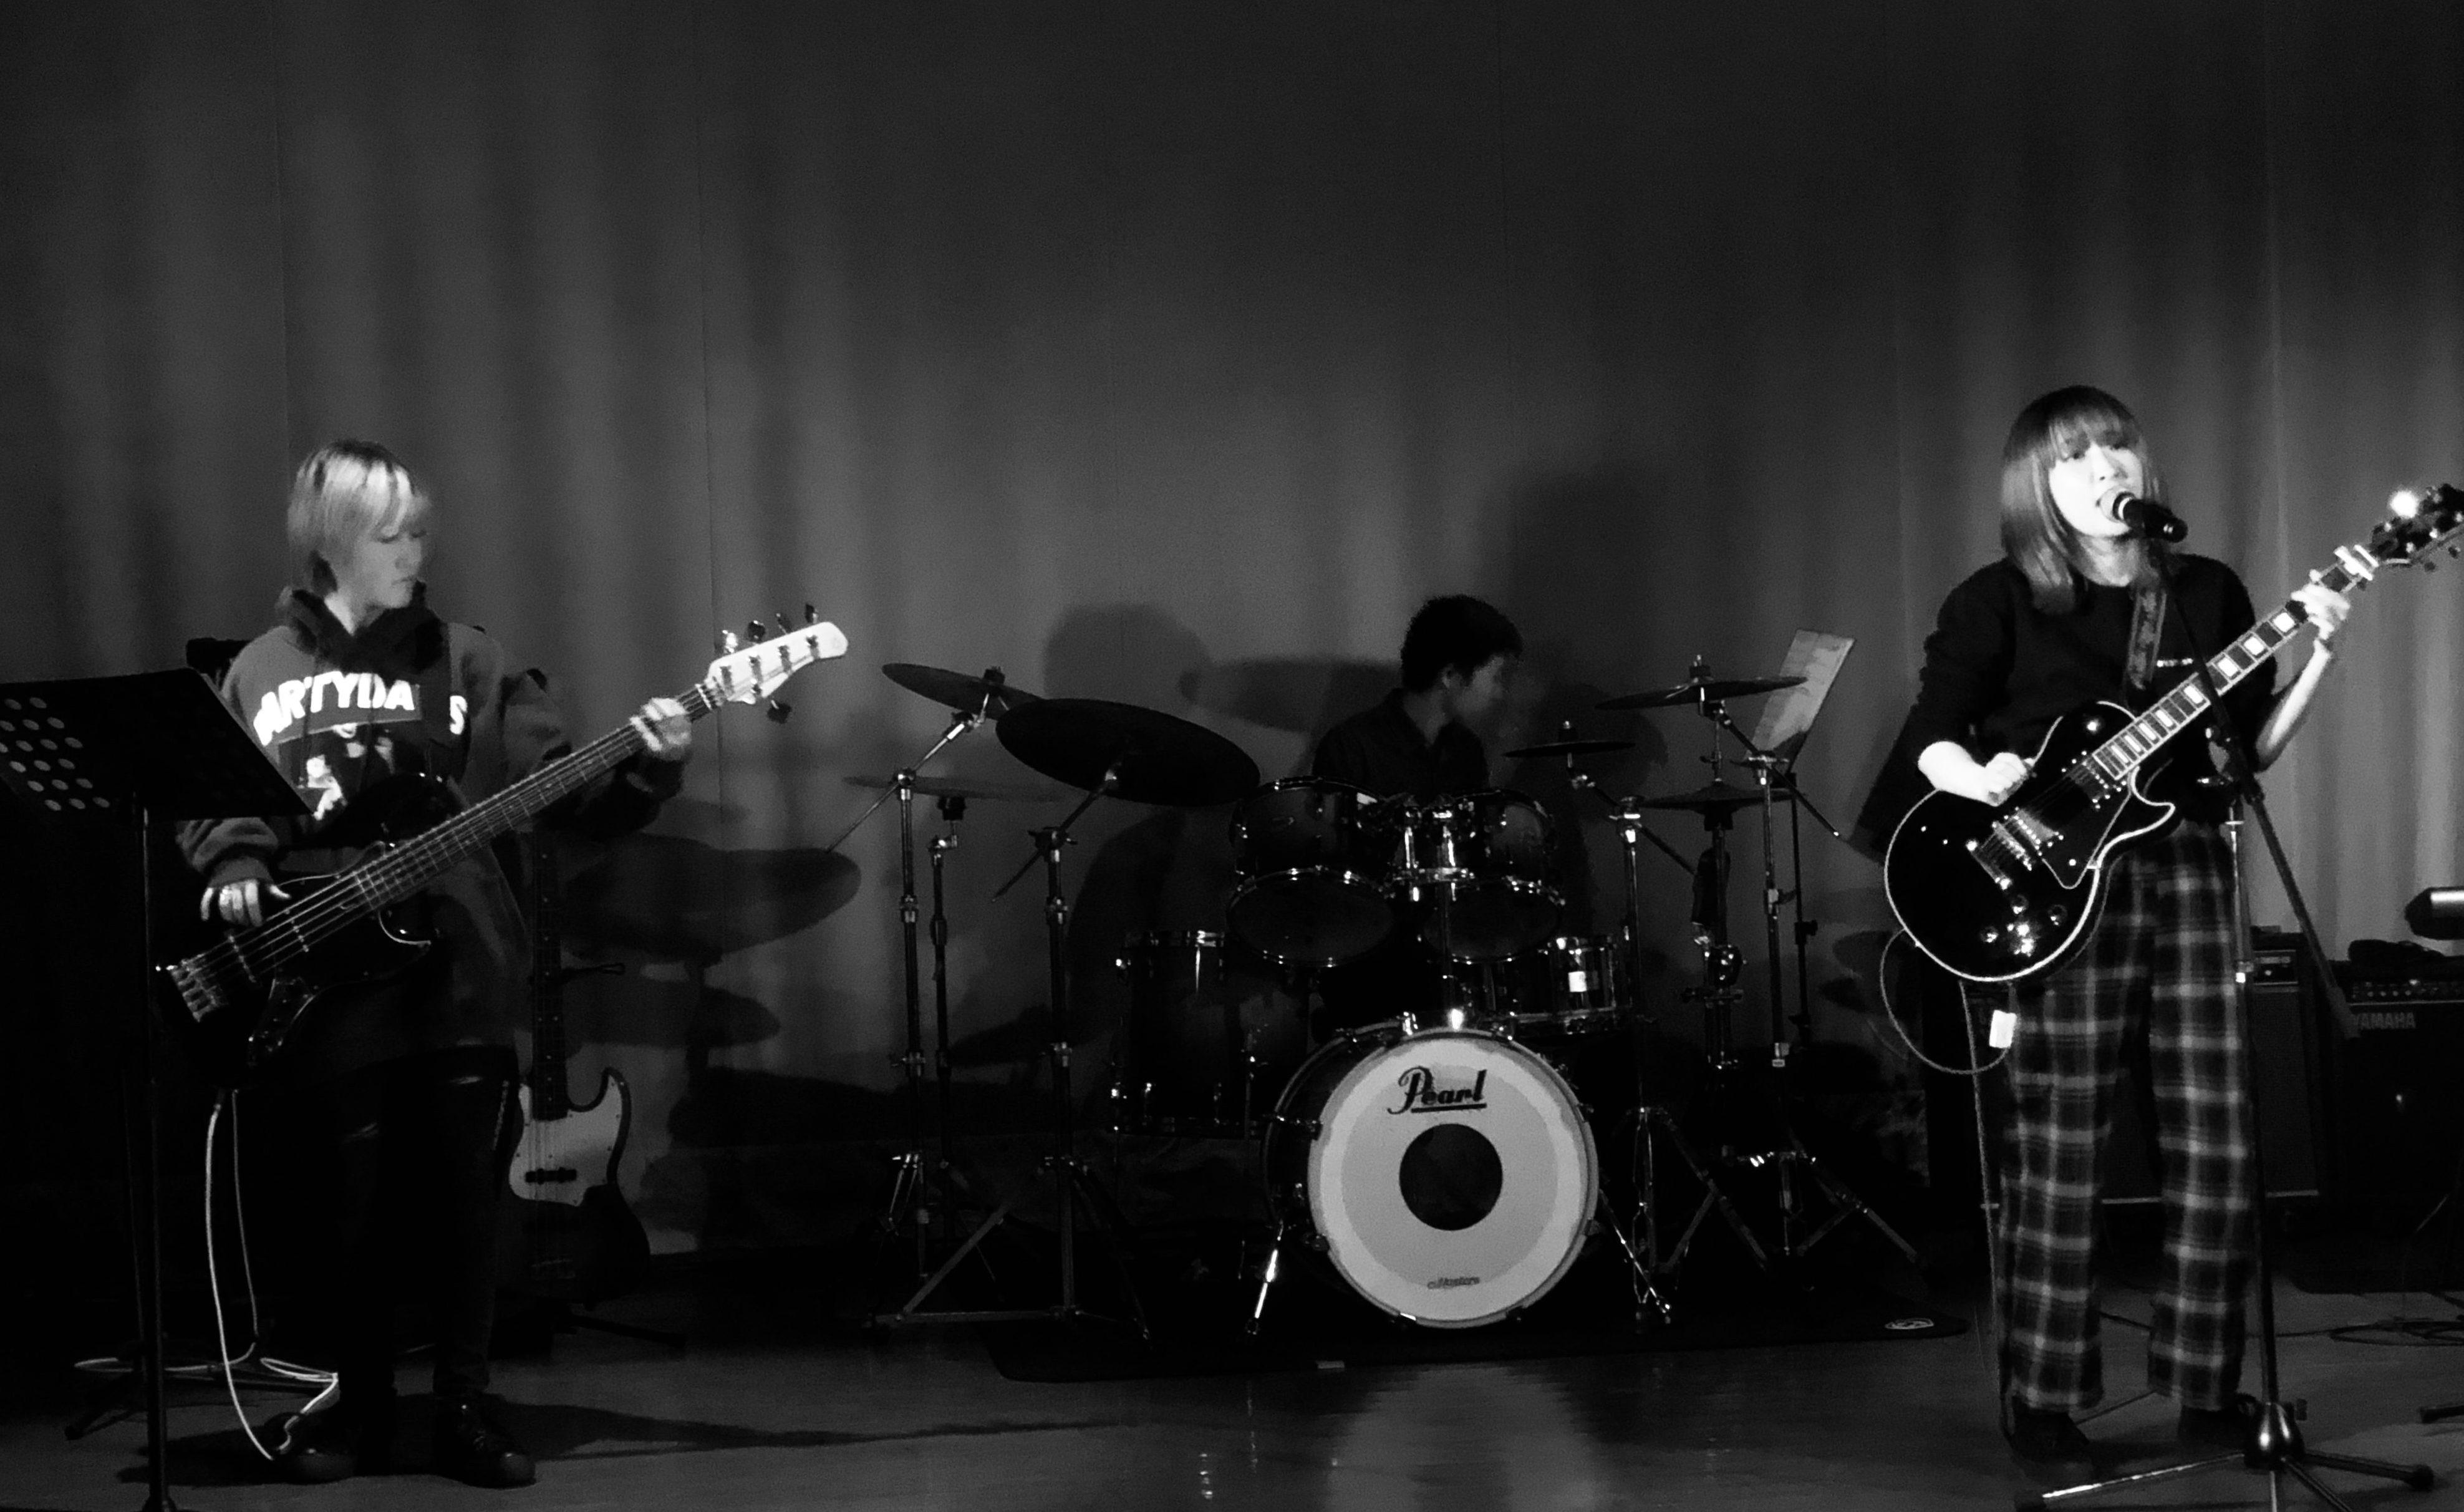 MIICA LIVE FESTIVAL Vol.3を開催しました。